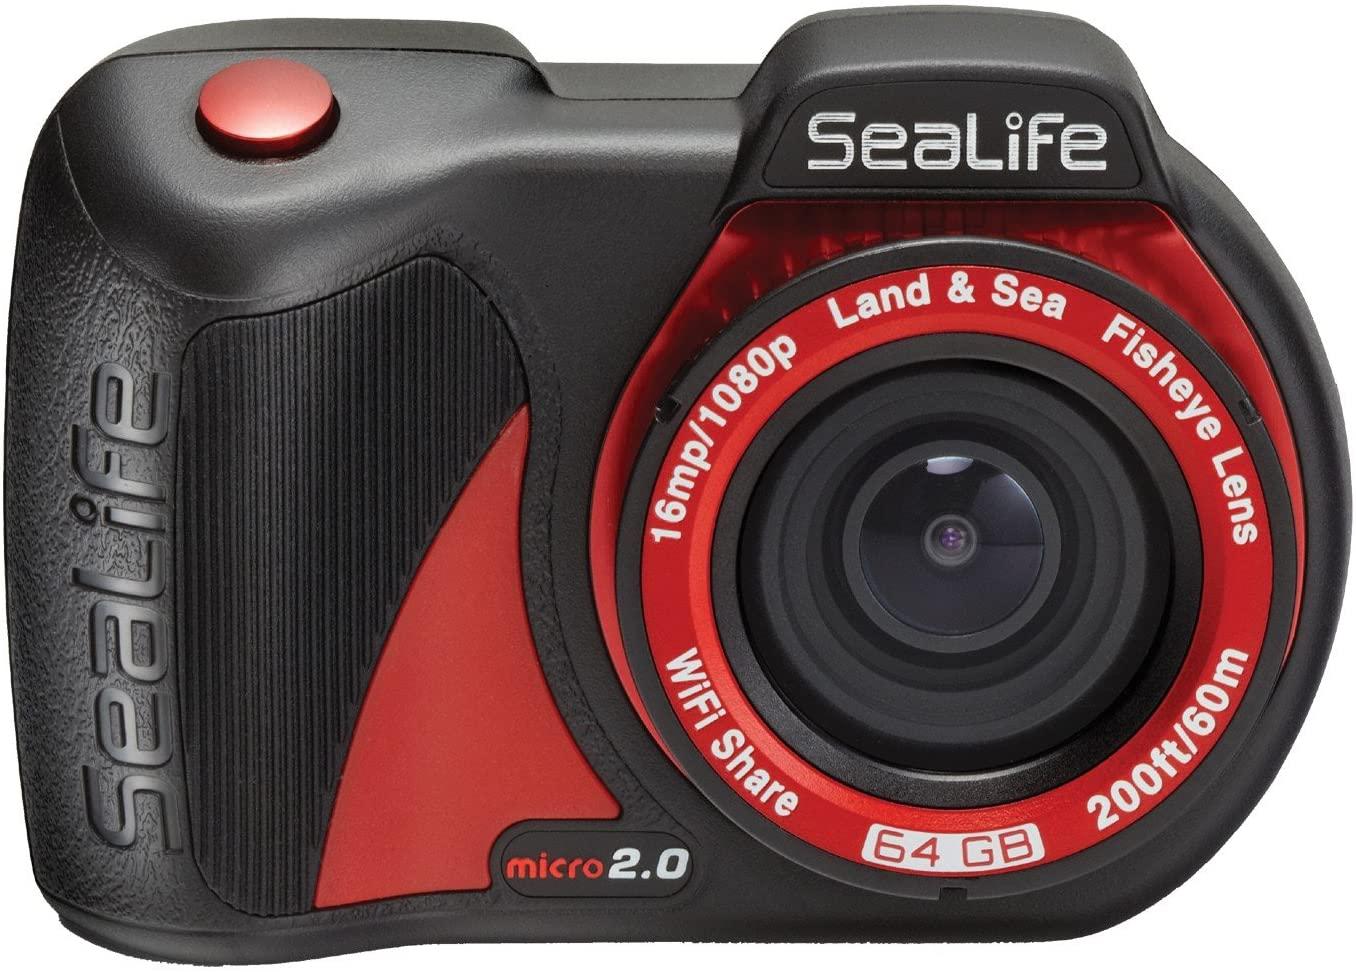 SeaLife Micro 2.0 64 MB wifi - Gebraucht